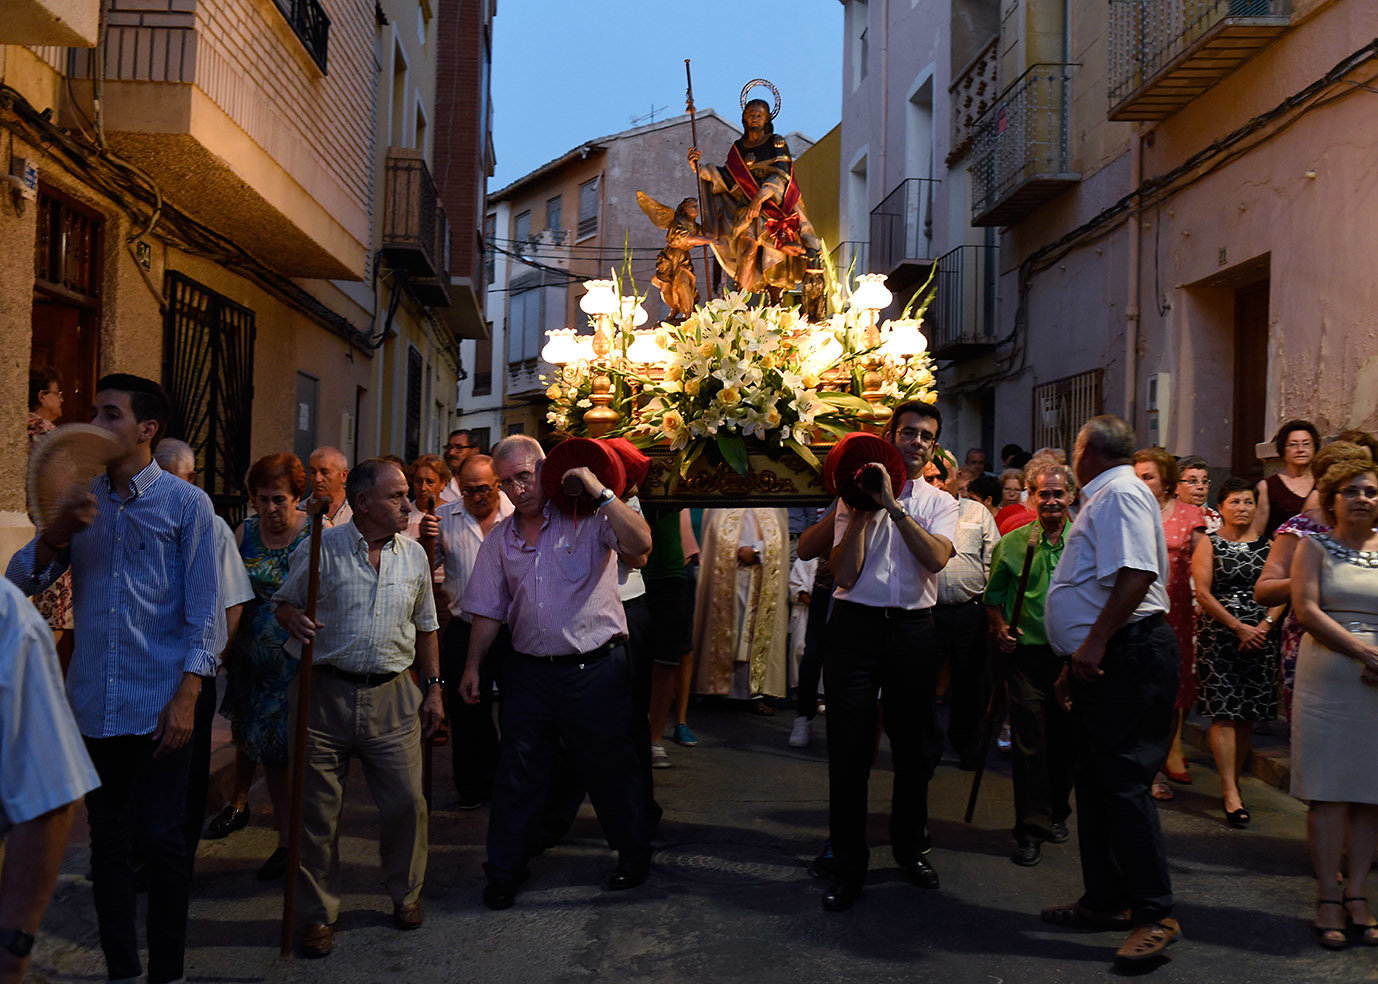 processie lijden.jpg